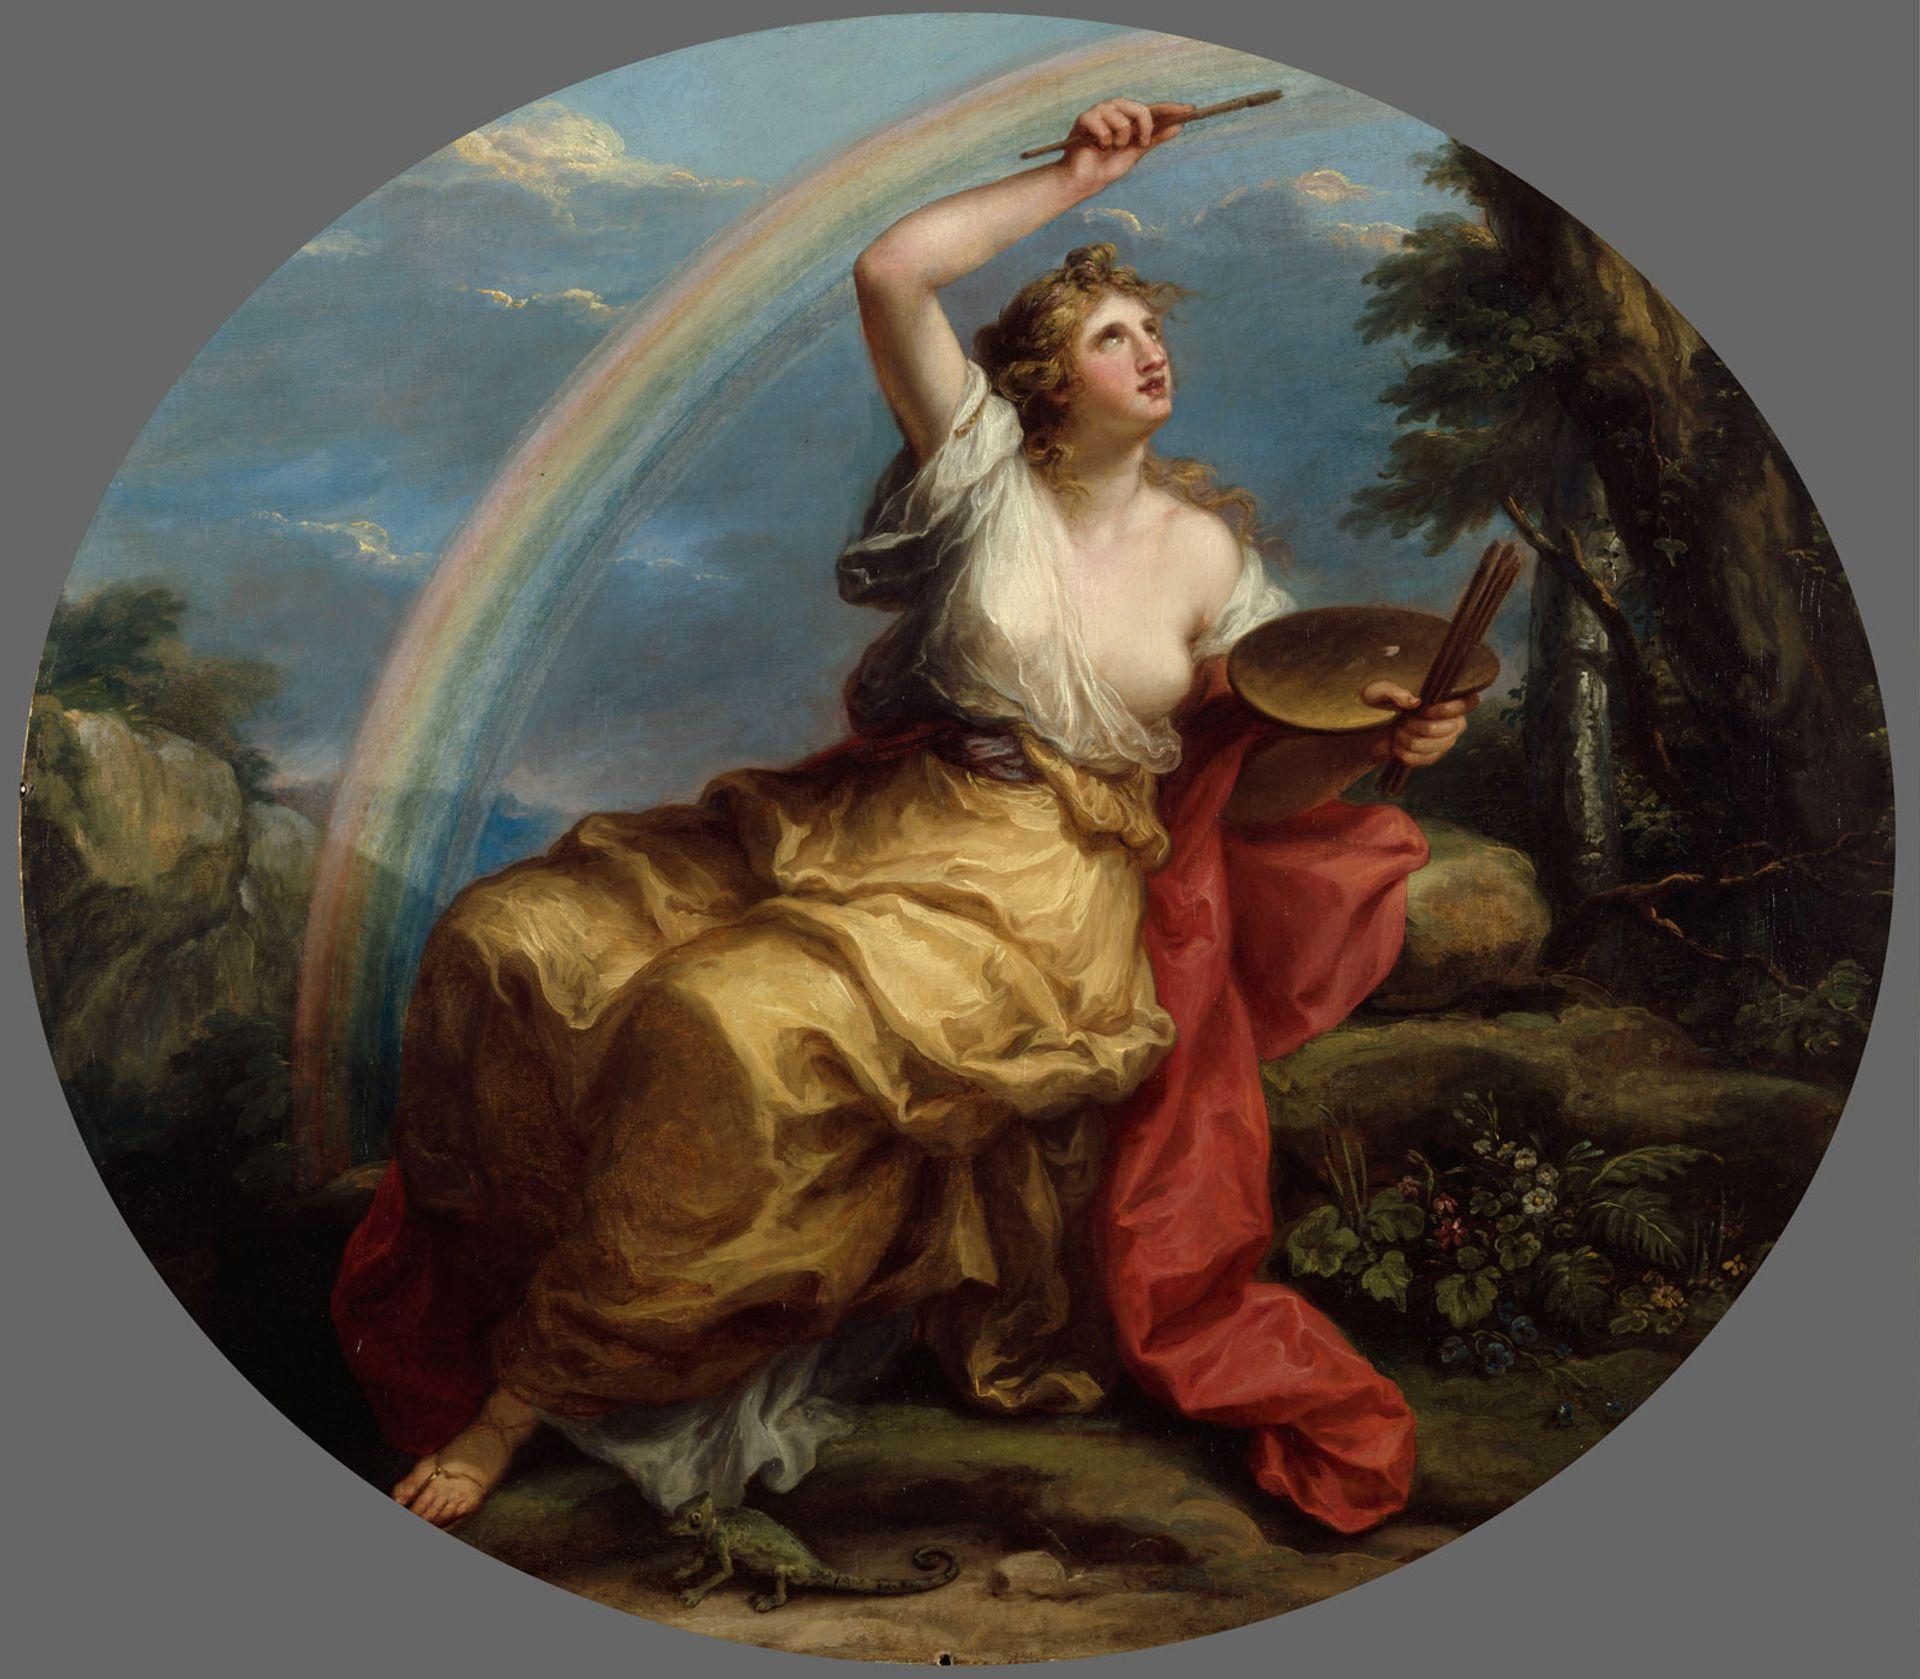 Over the rainbow: Colour (1778-80) is one of Kauffman's four Royal Academy of Arts ceiling allegories © Royal Academy of Arts. Photo: John Hammond